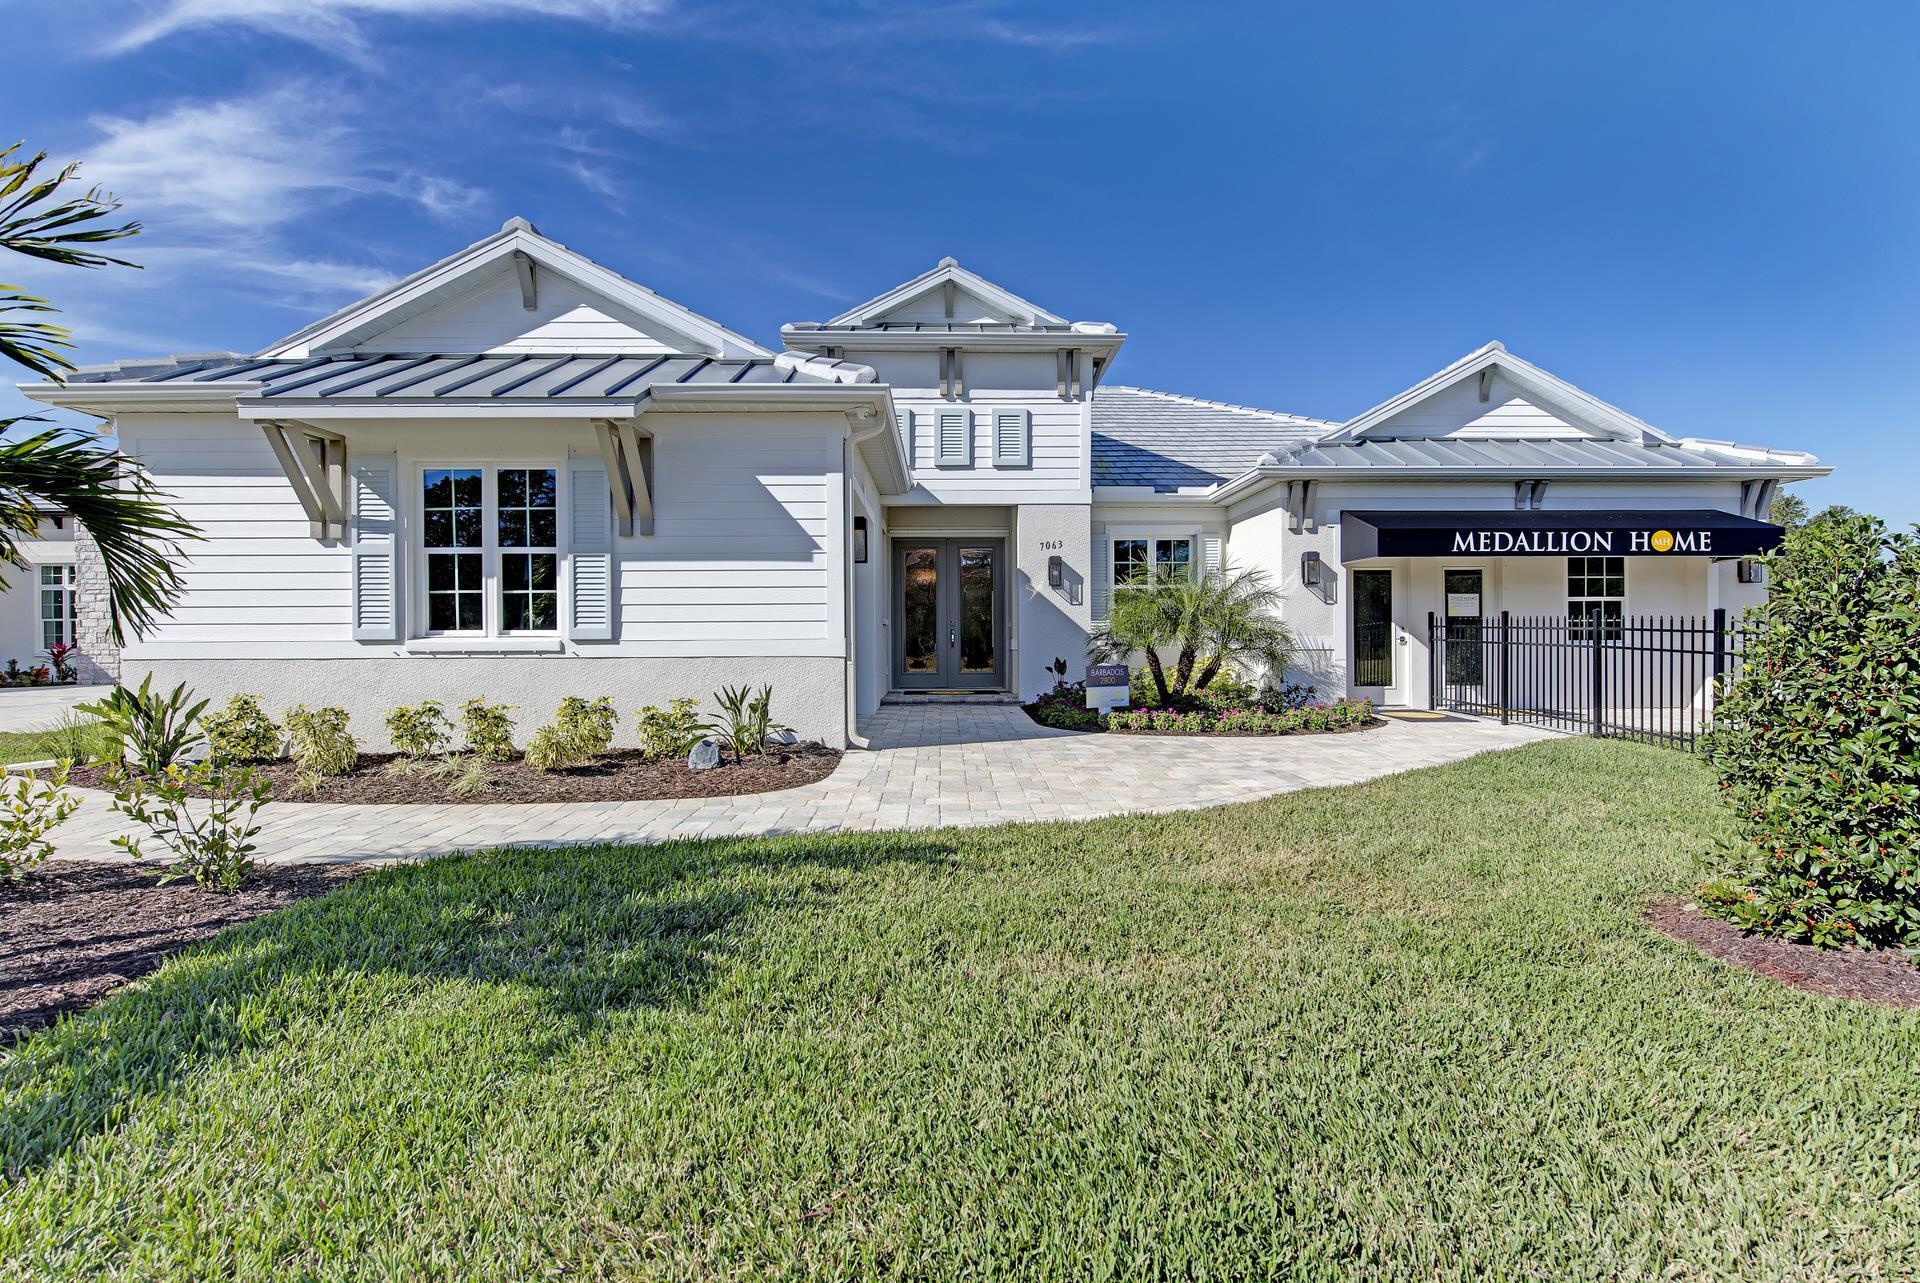 'Waverley' by Medallion Home in Sarasota-Bradenton